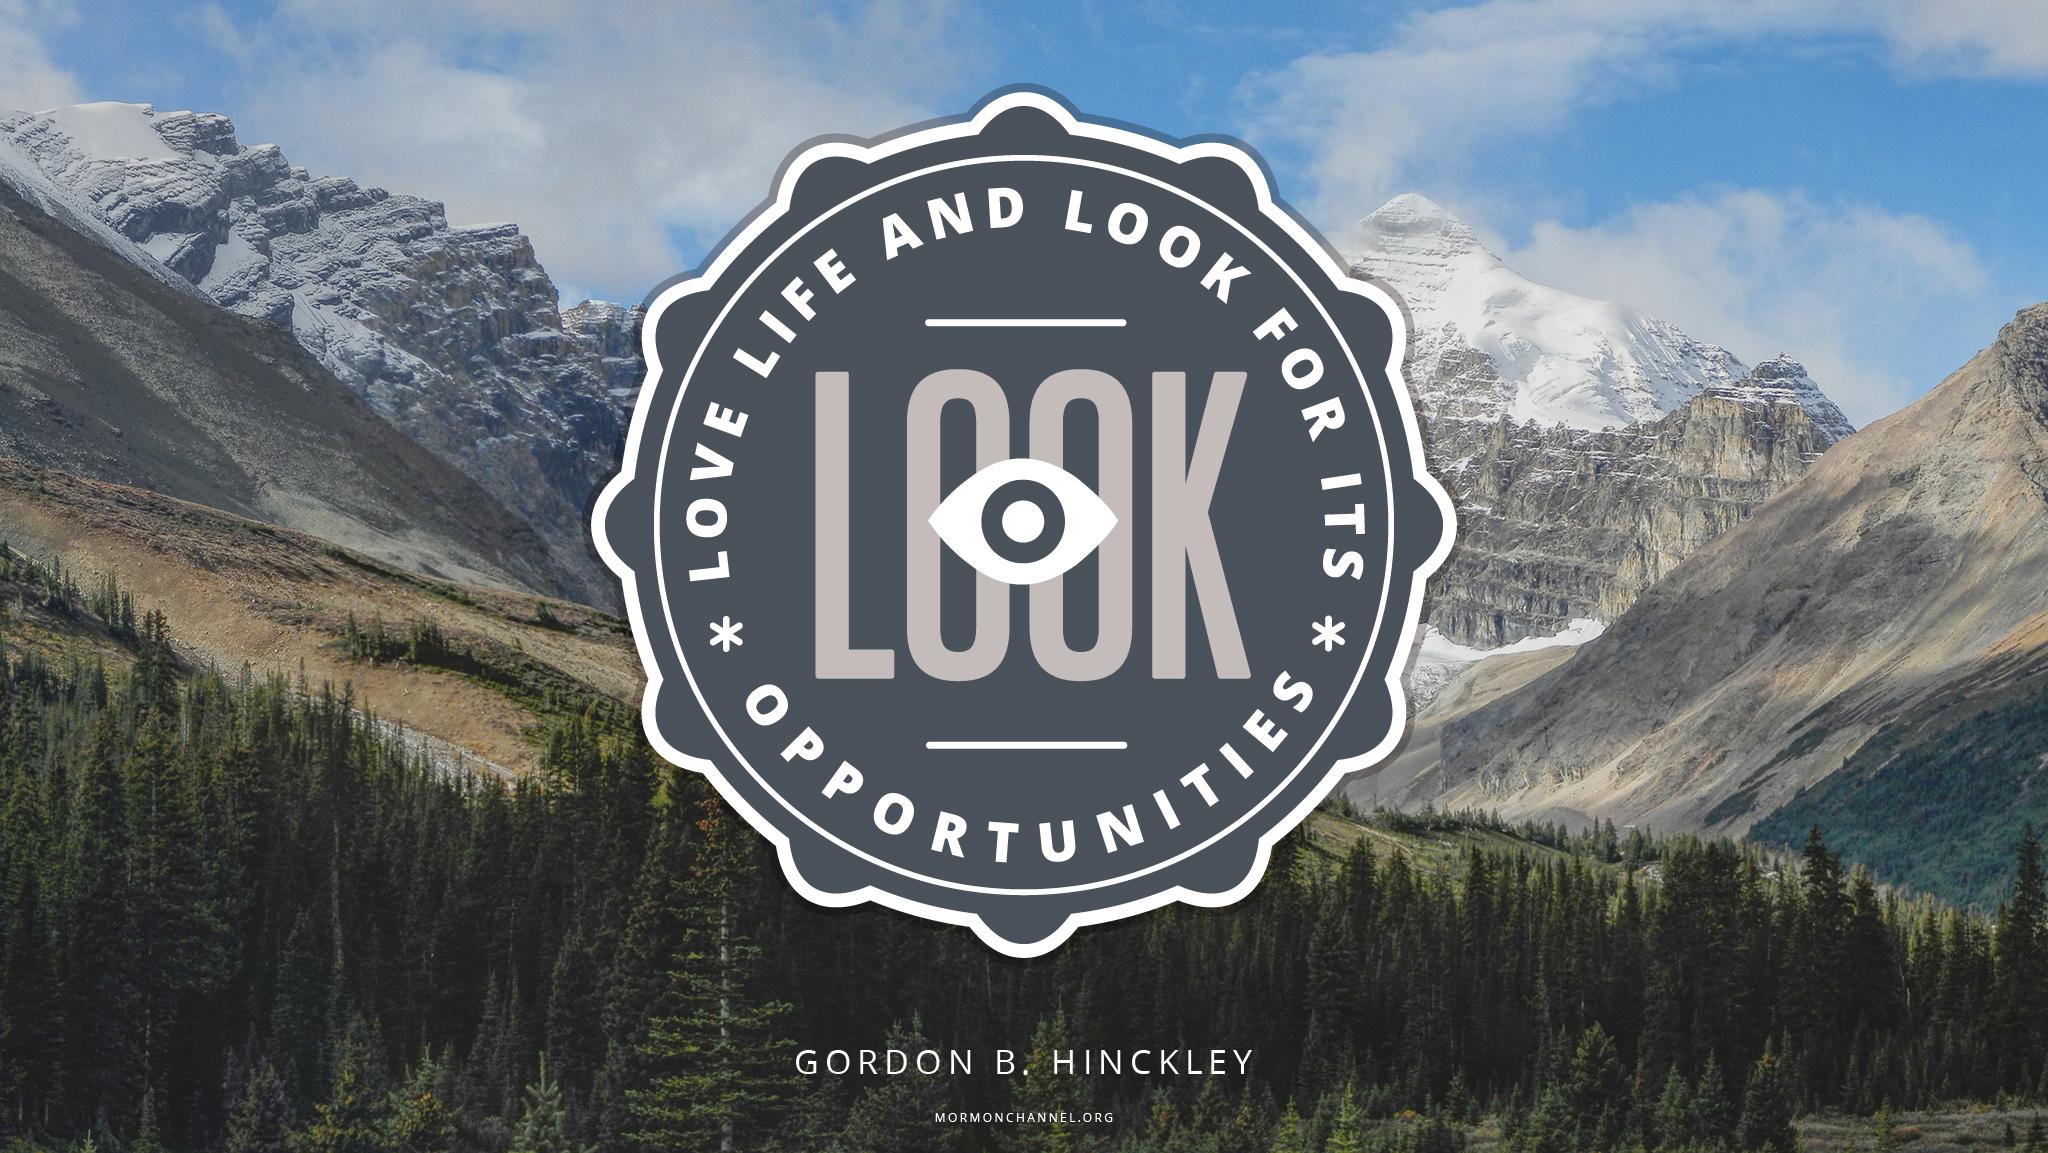 Gordon B Hinckley Quotes Daily Quote Love Life  Mormon Channel